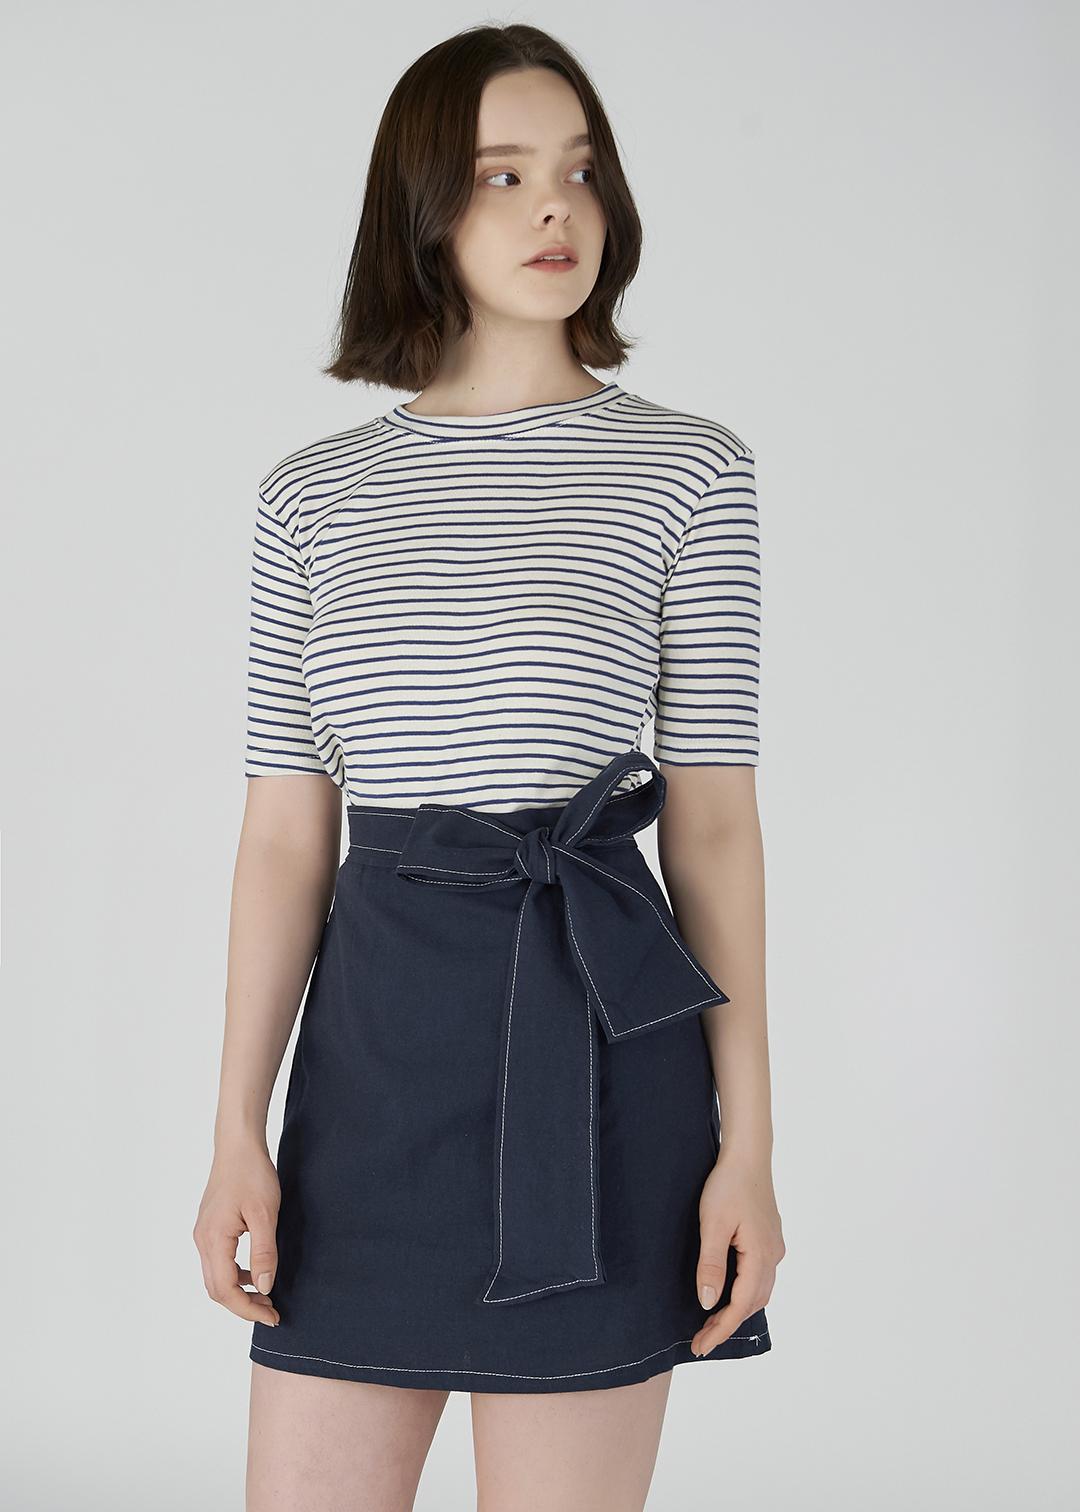 Stich Ribbon Skirt